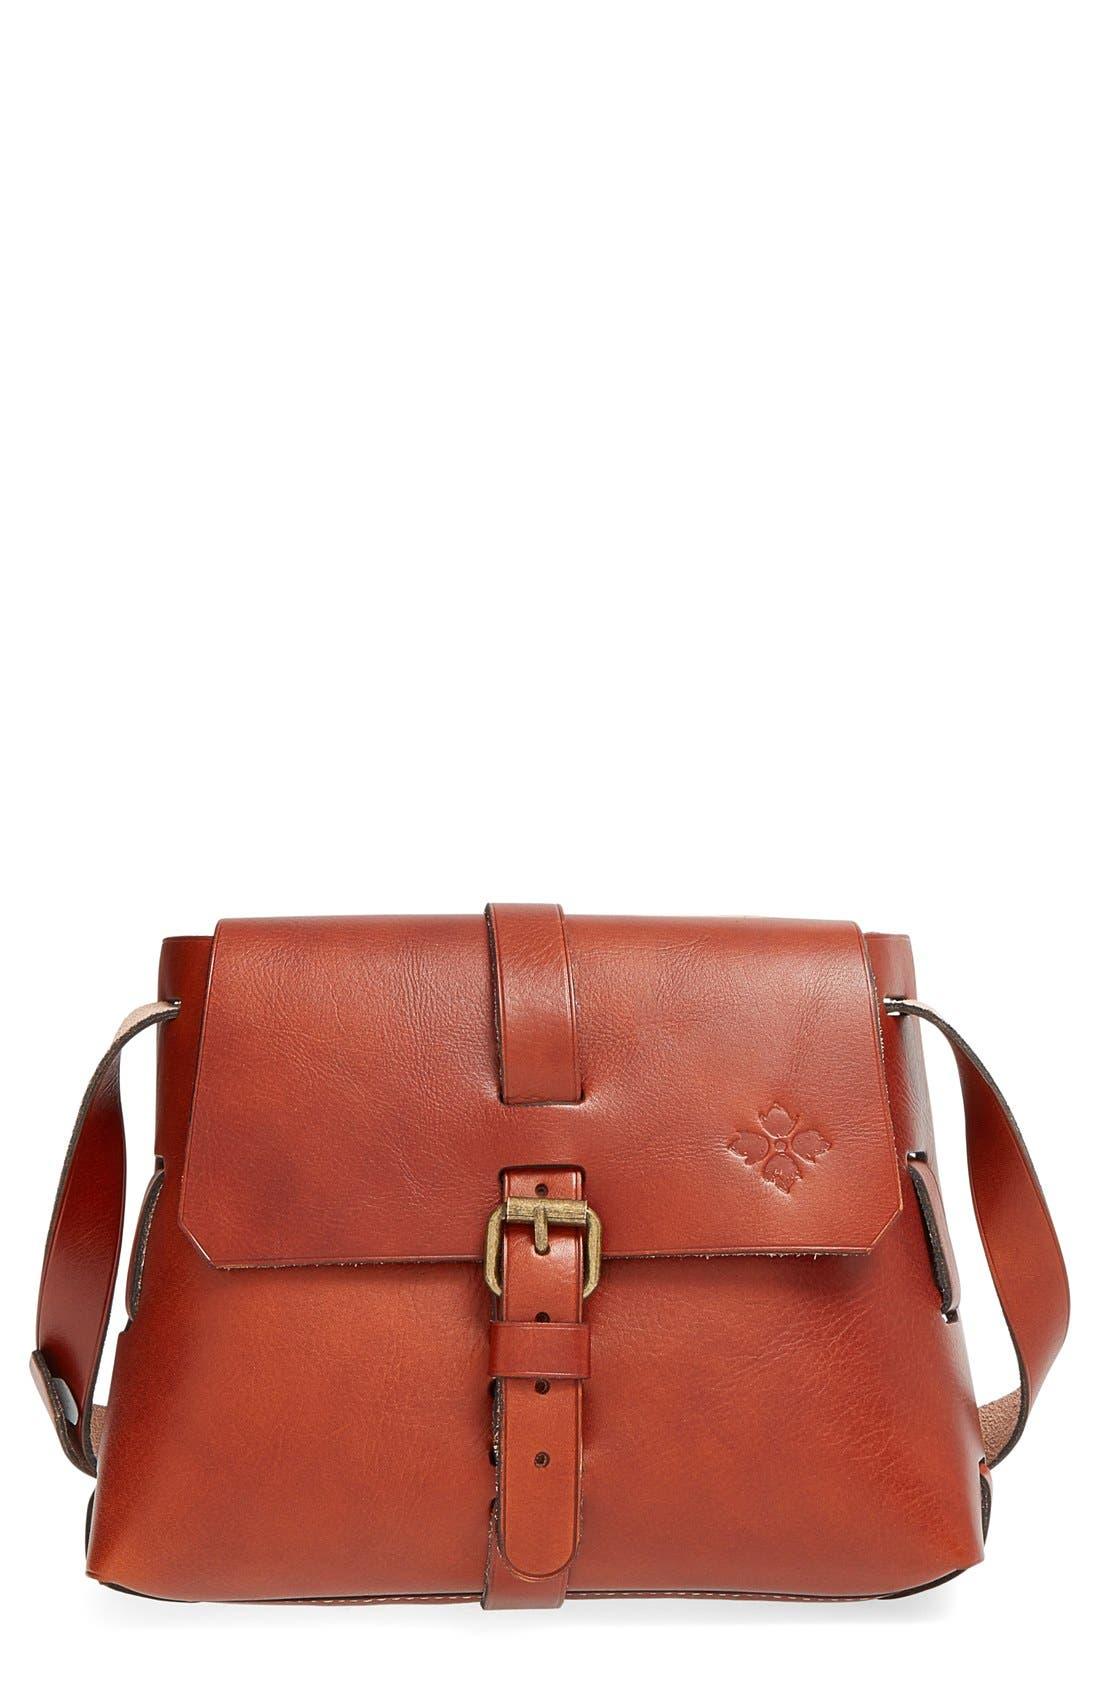 Alternate Image 1 Selected - Patricia Nash 'Frattini' Crossbody Bag